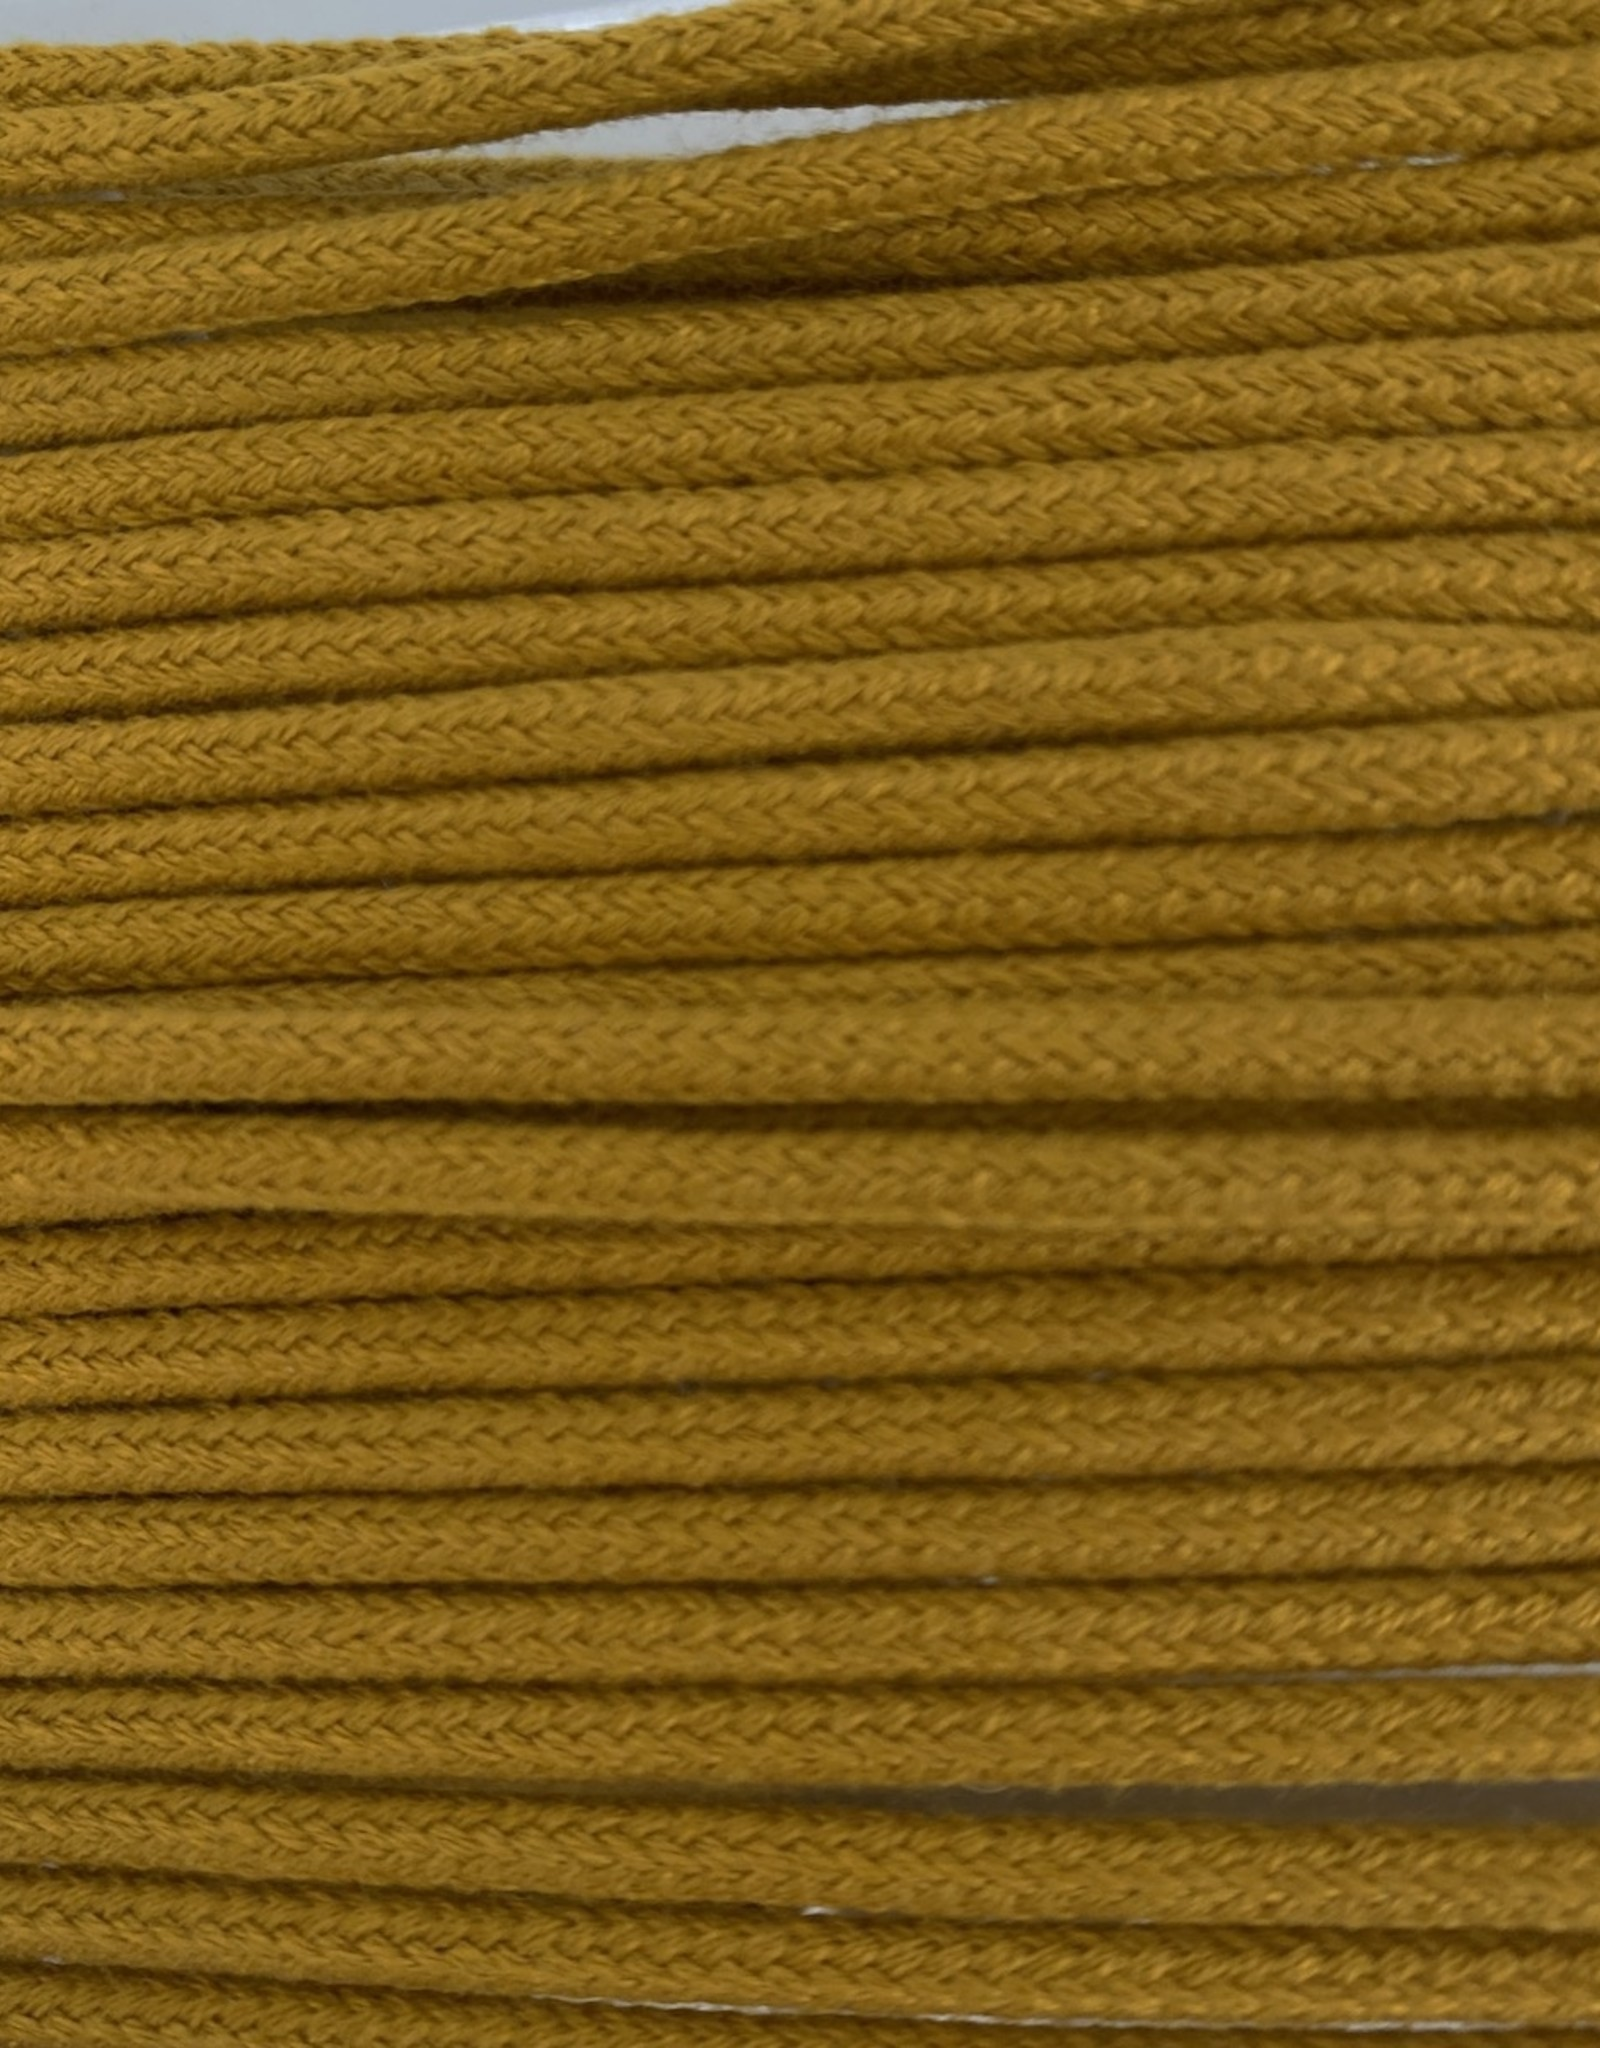 Koord Katoen - Oker geel